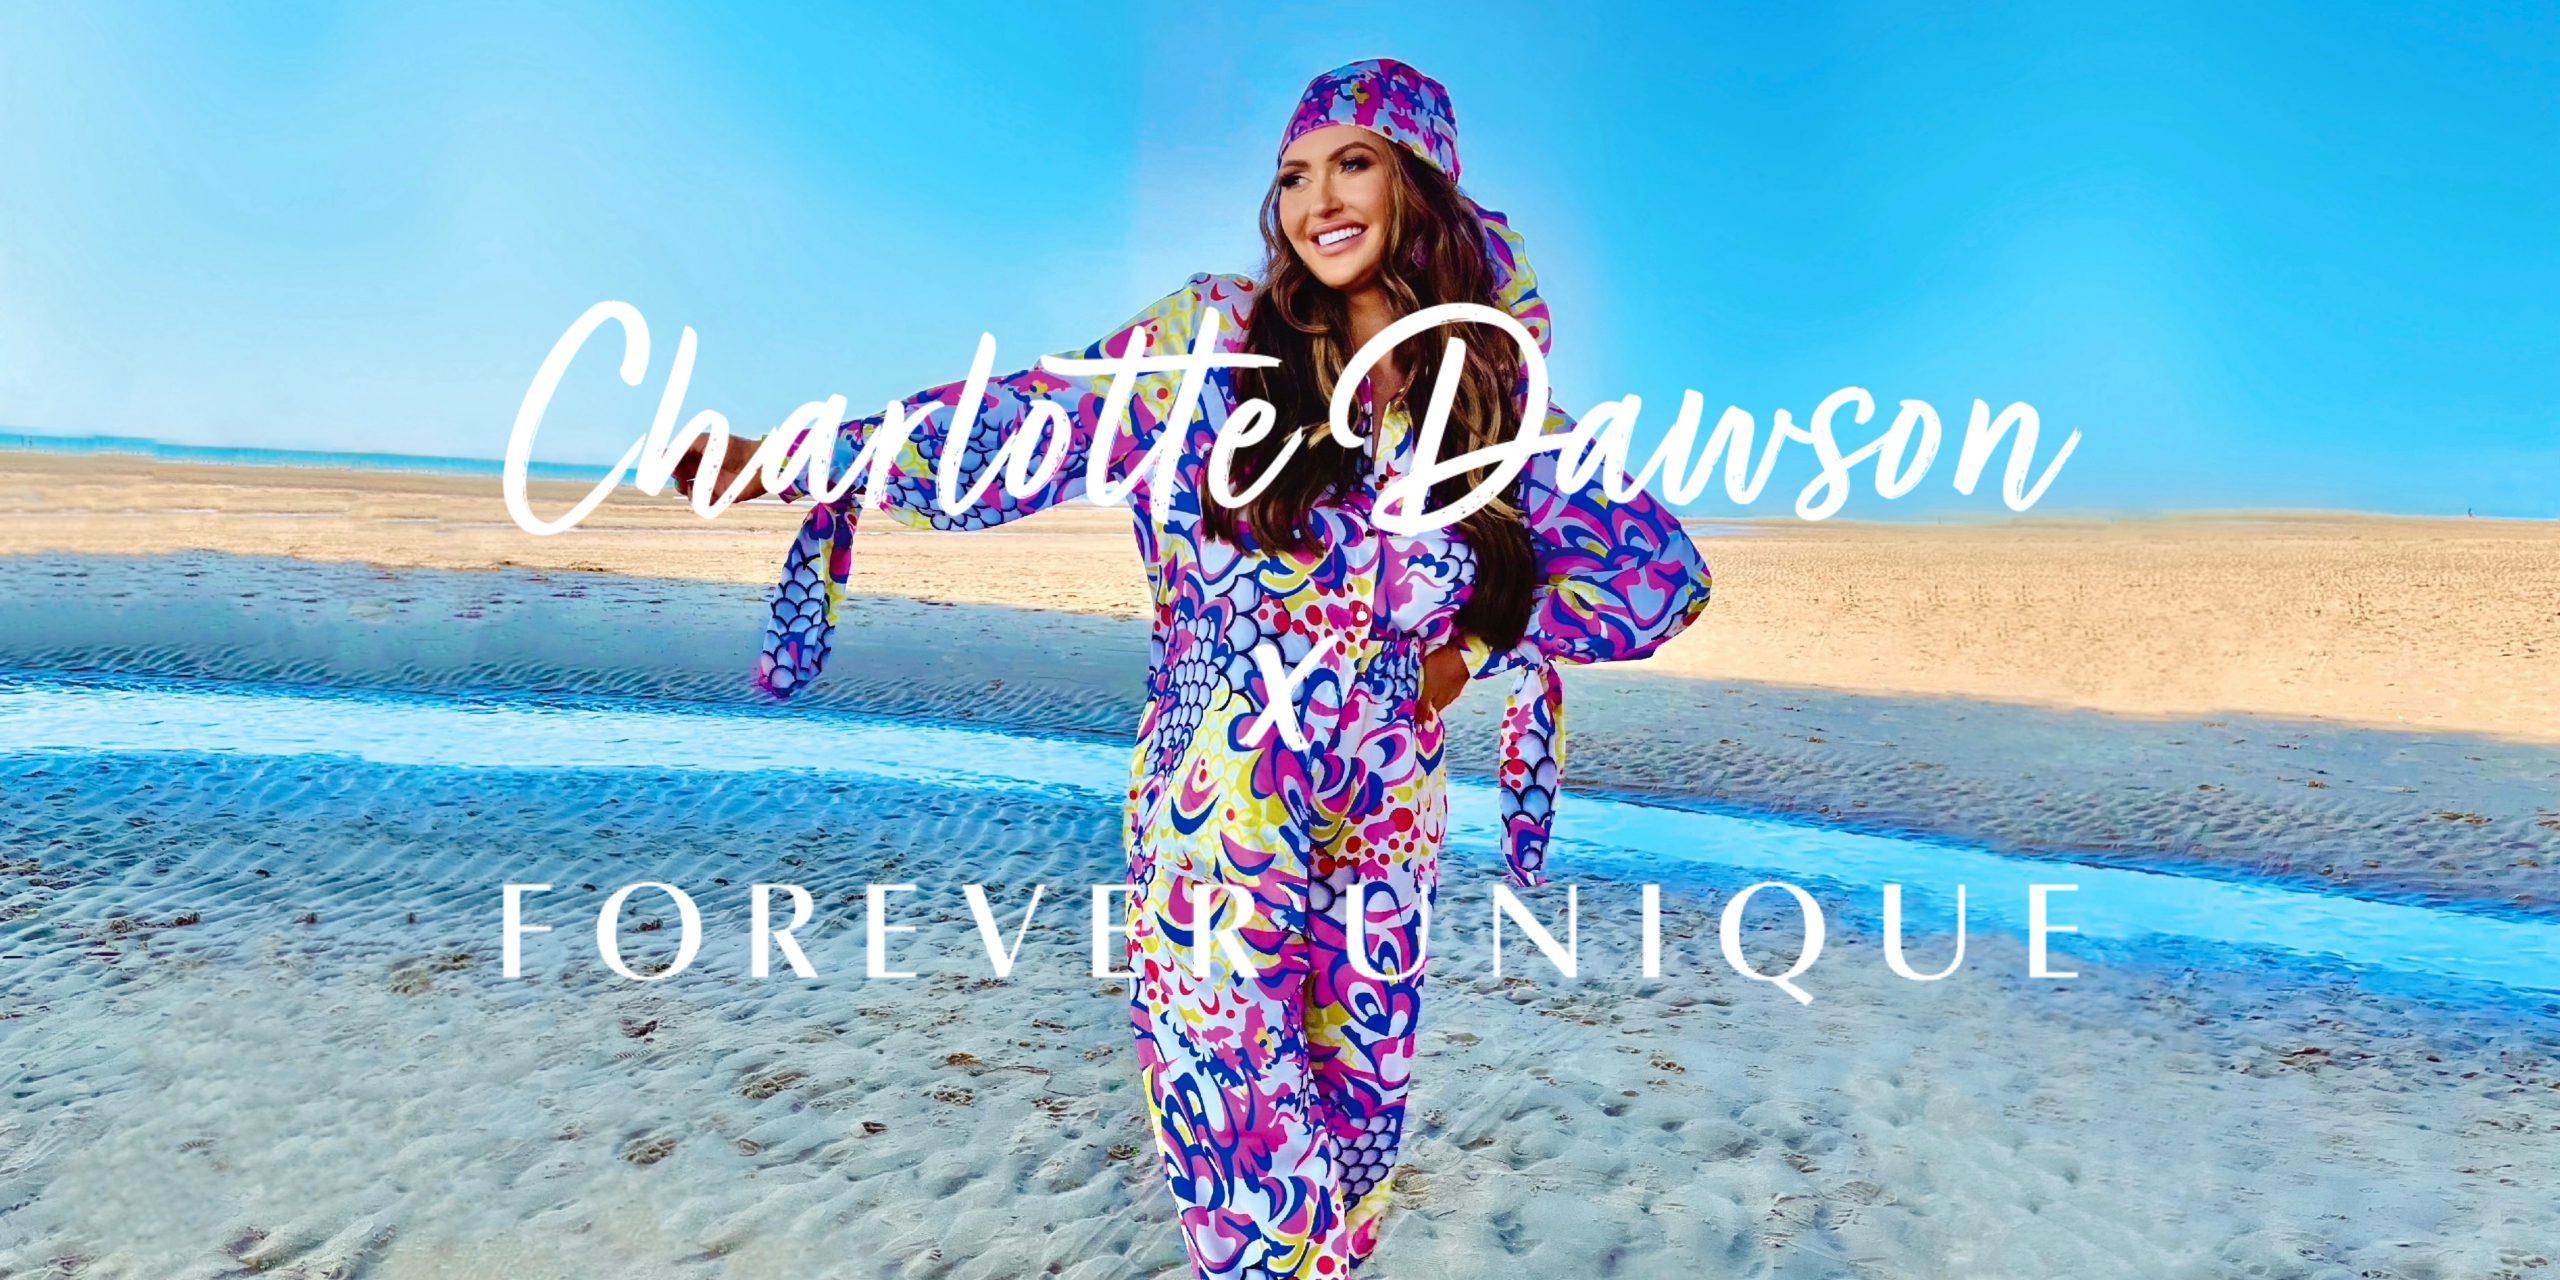 'Honest' by Charlotte Dawson | Charlotte Dawson x Forever Unique